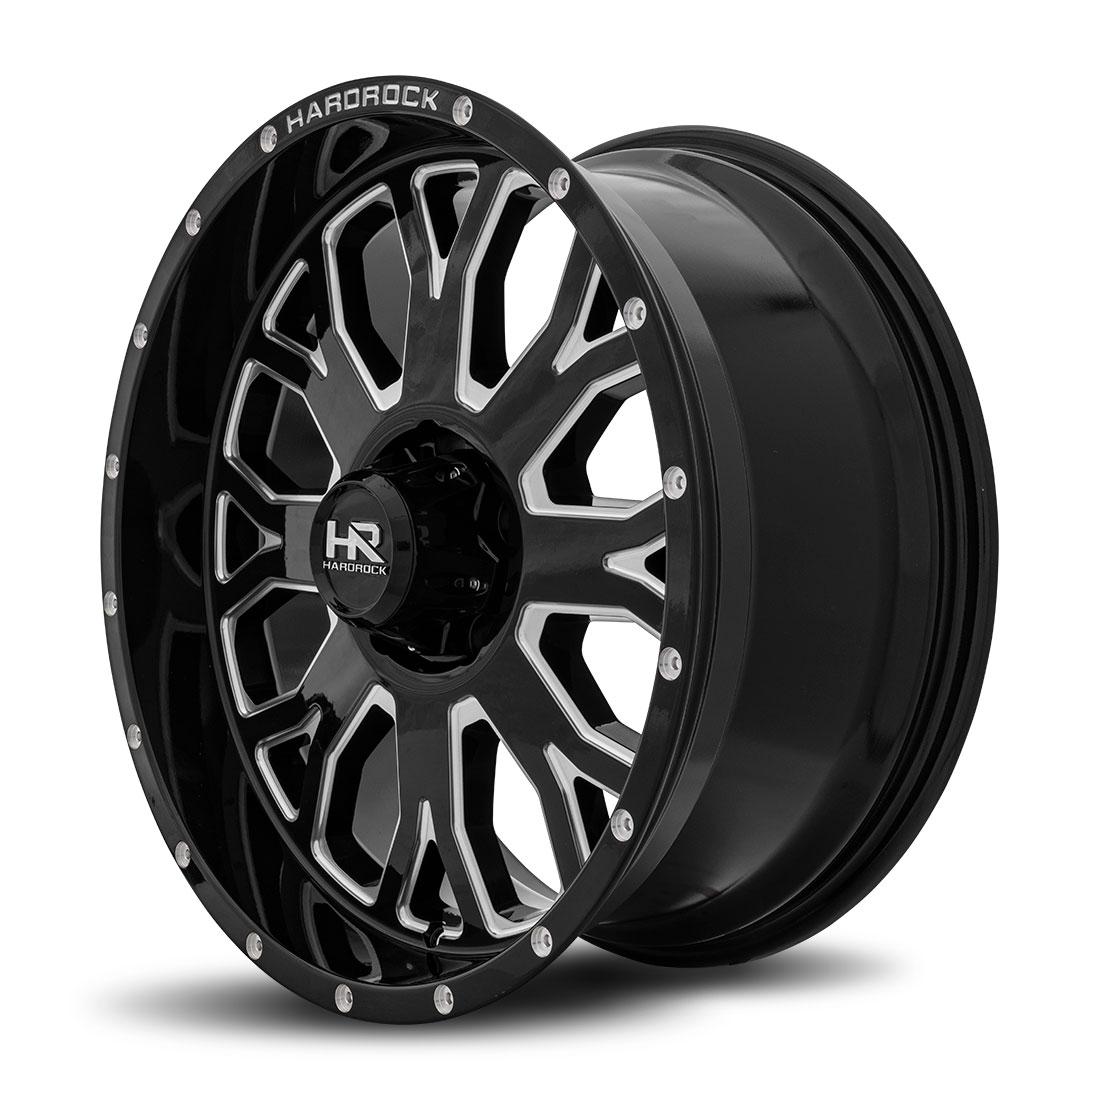 Hardrock Offroad Wheels H504 Slammer-Xposed - Gloss Black Milled - 20x9